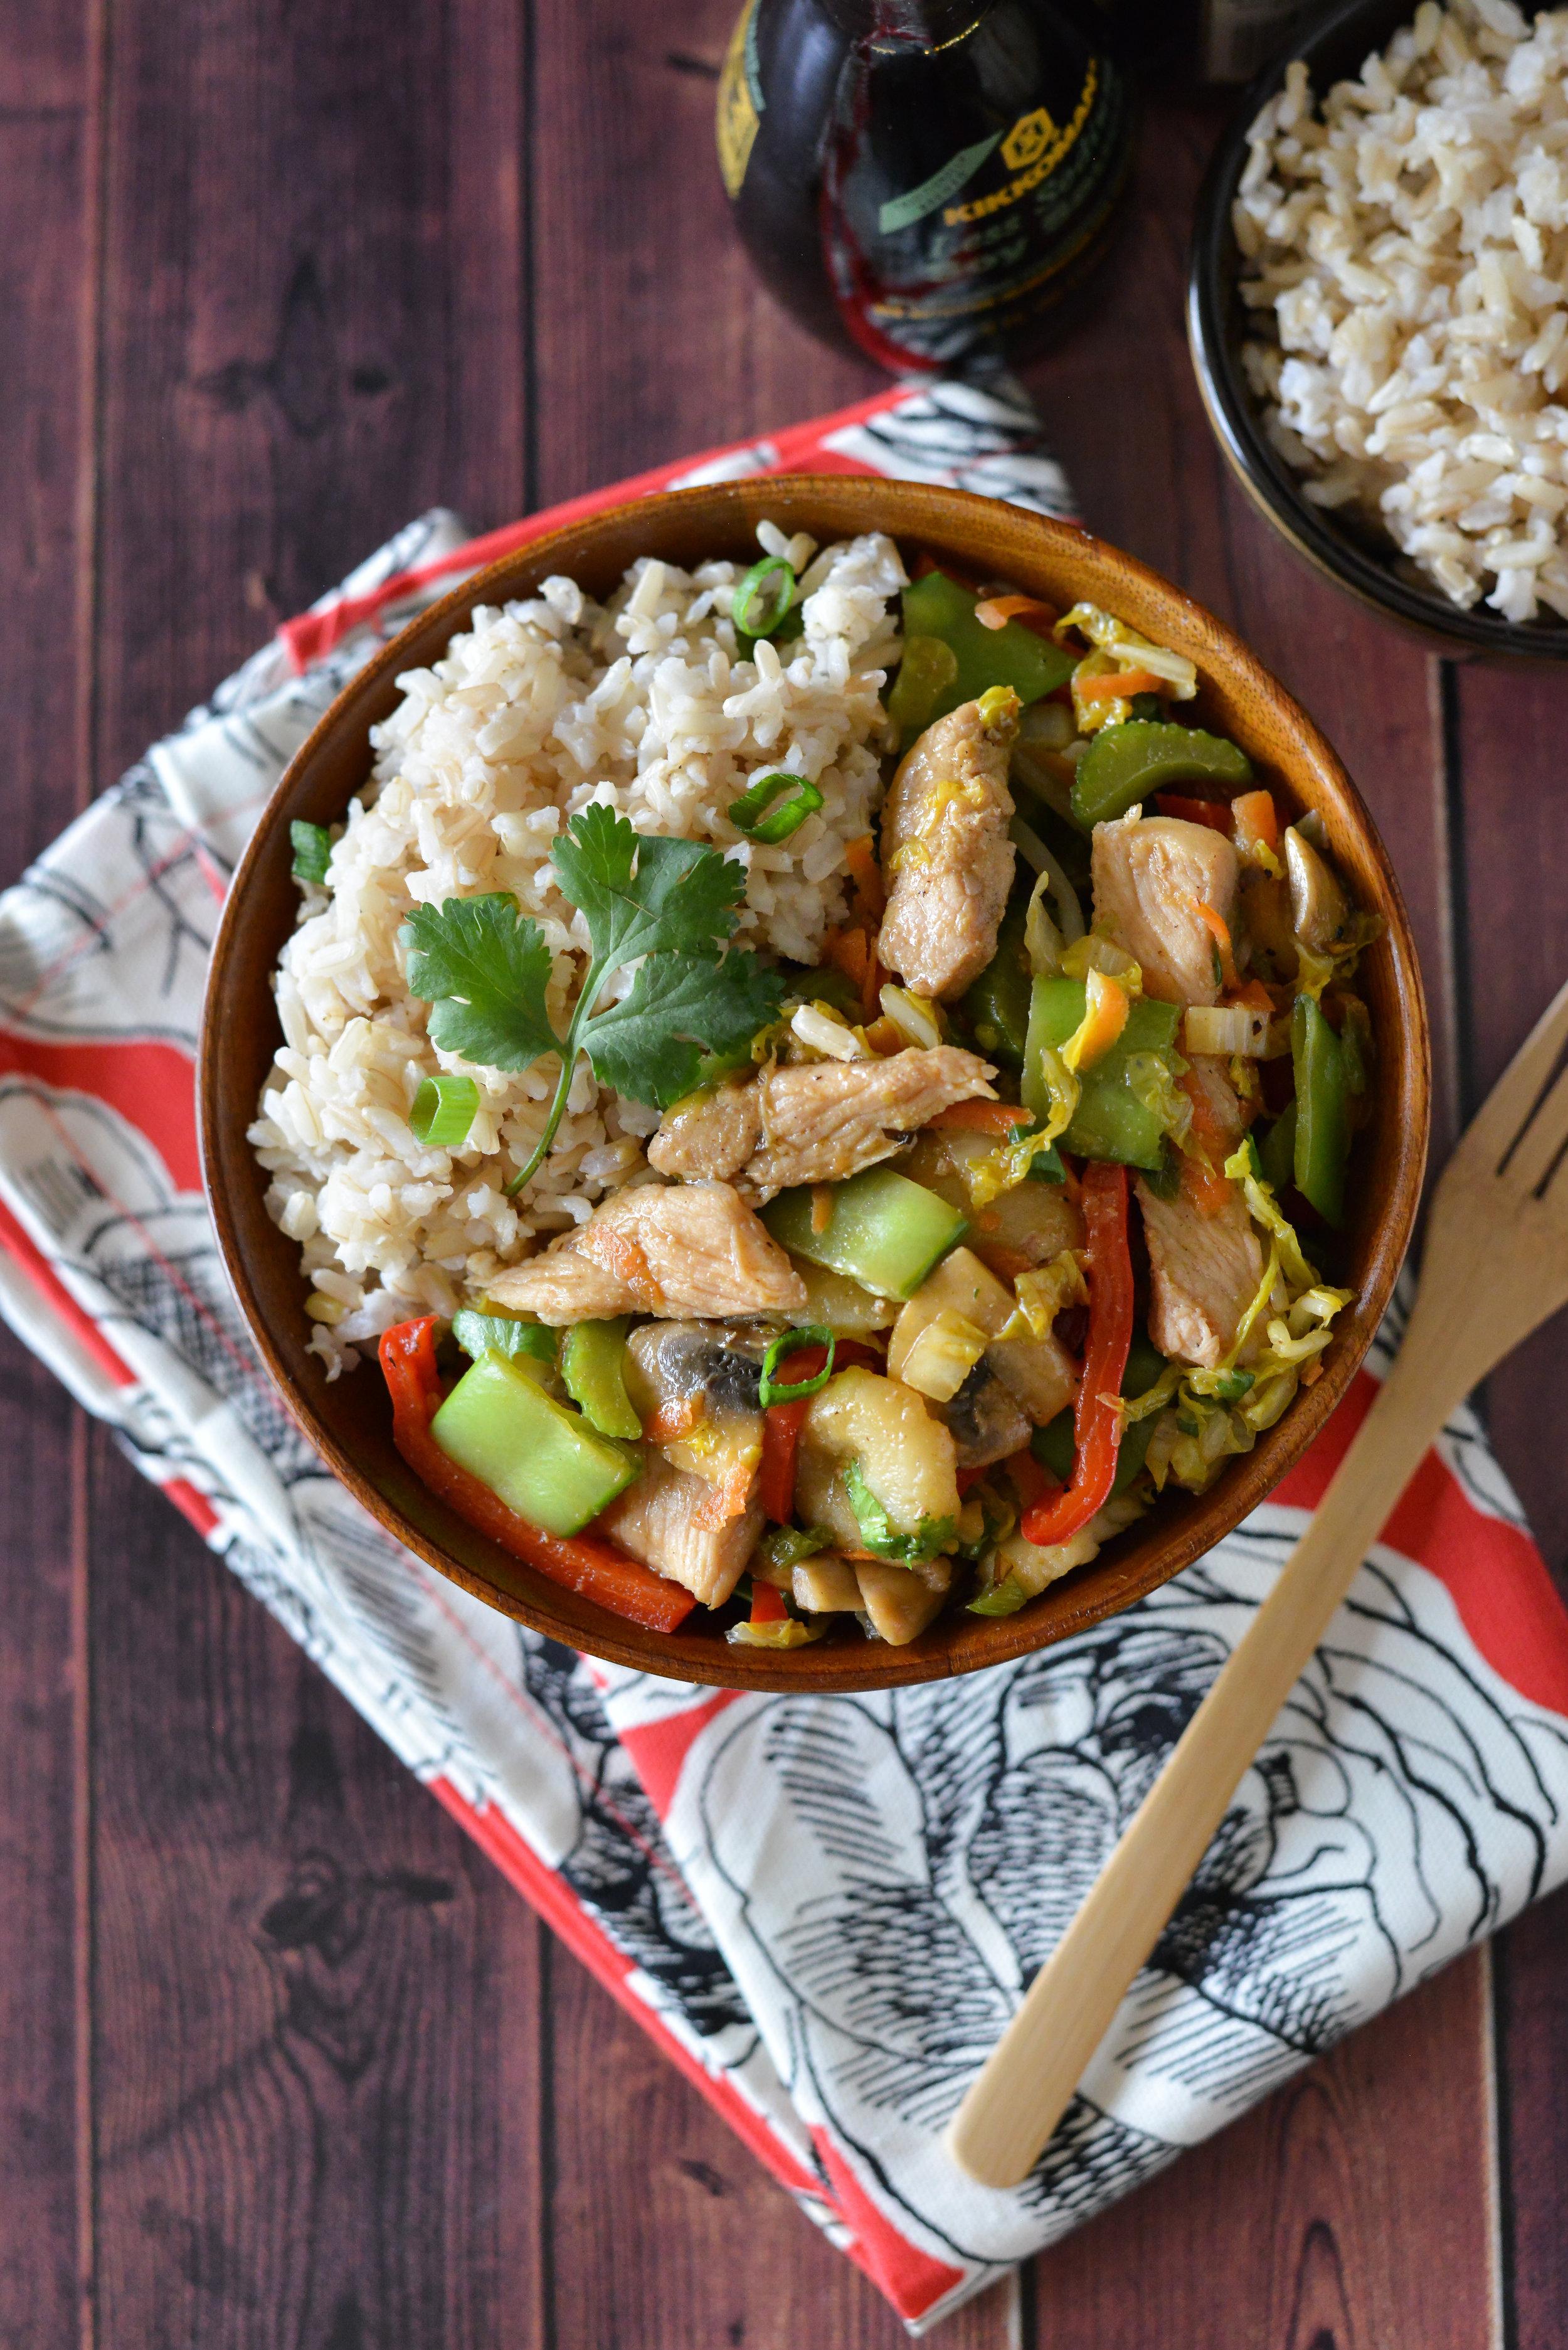 Pork Chop Stir Fry plated